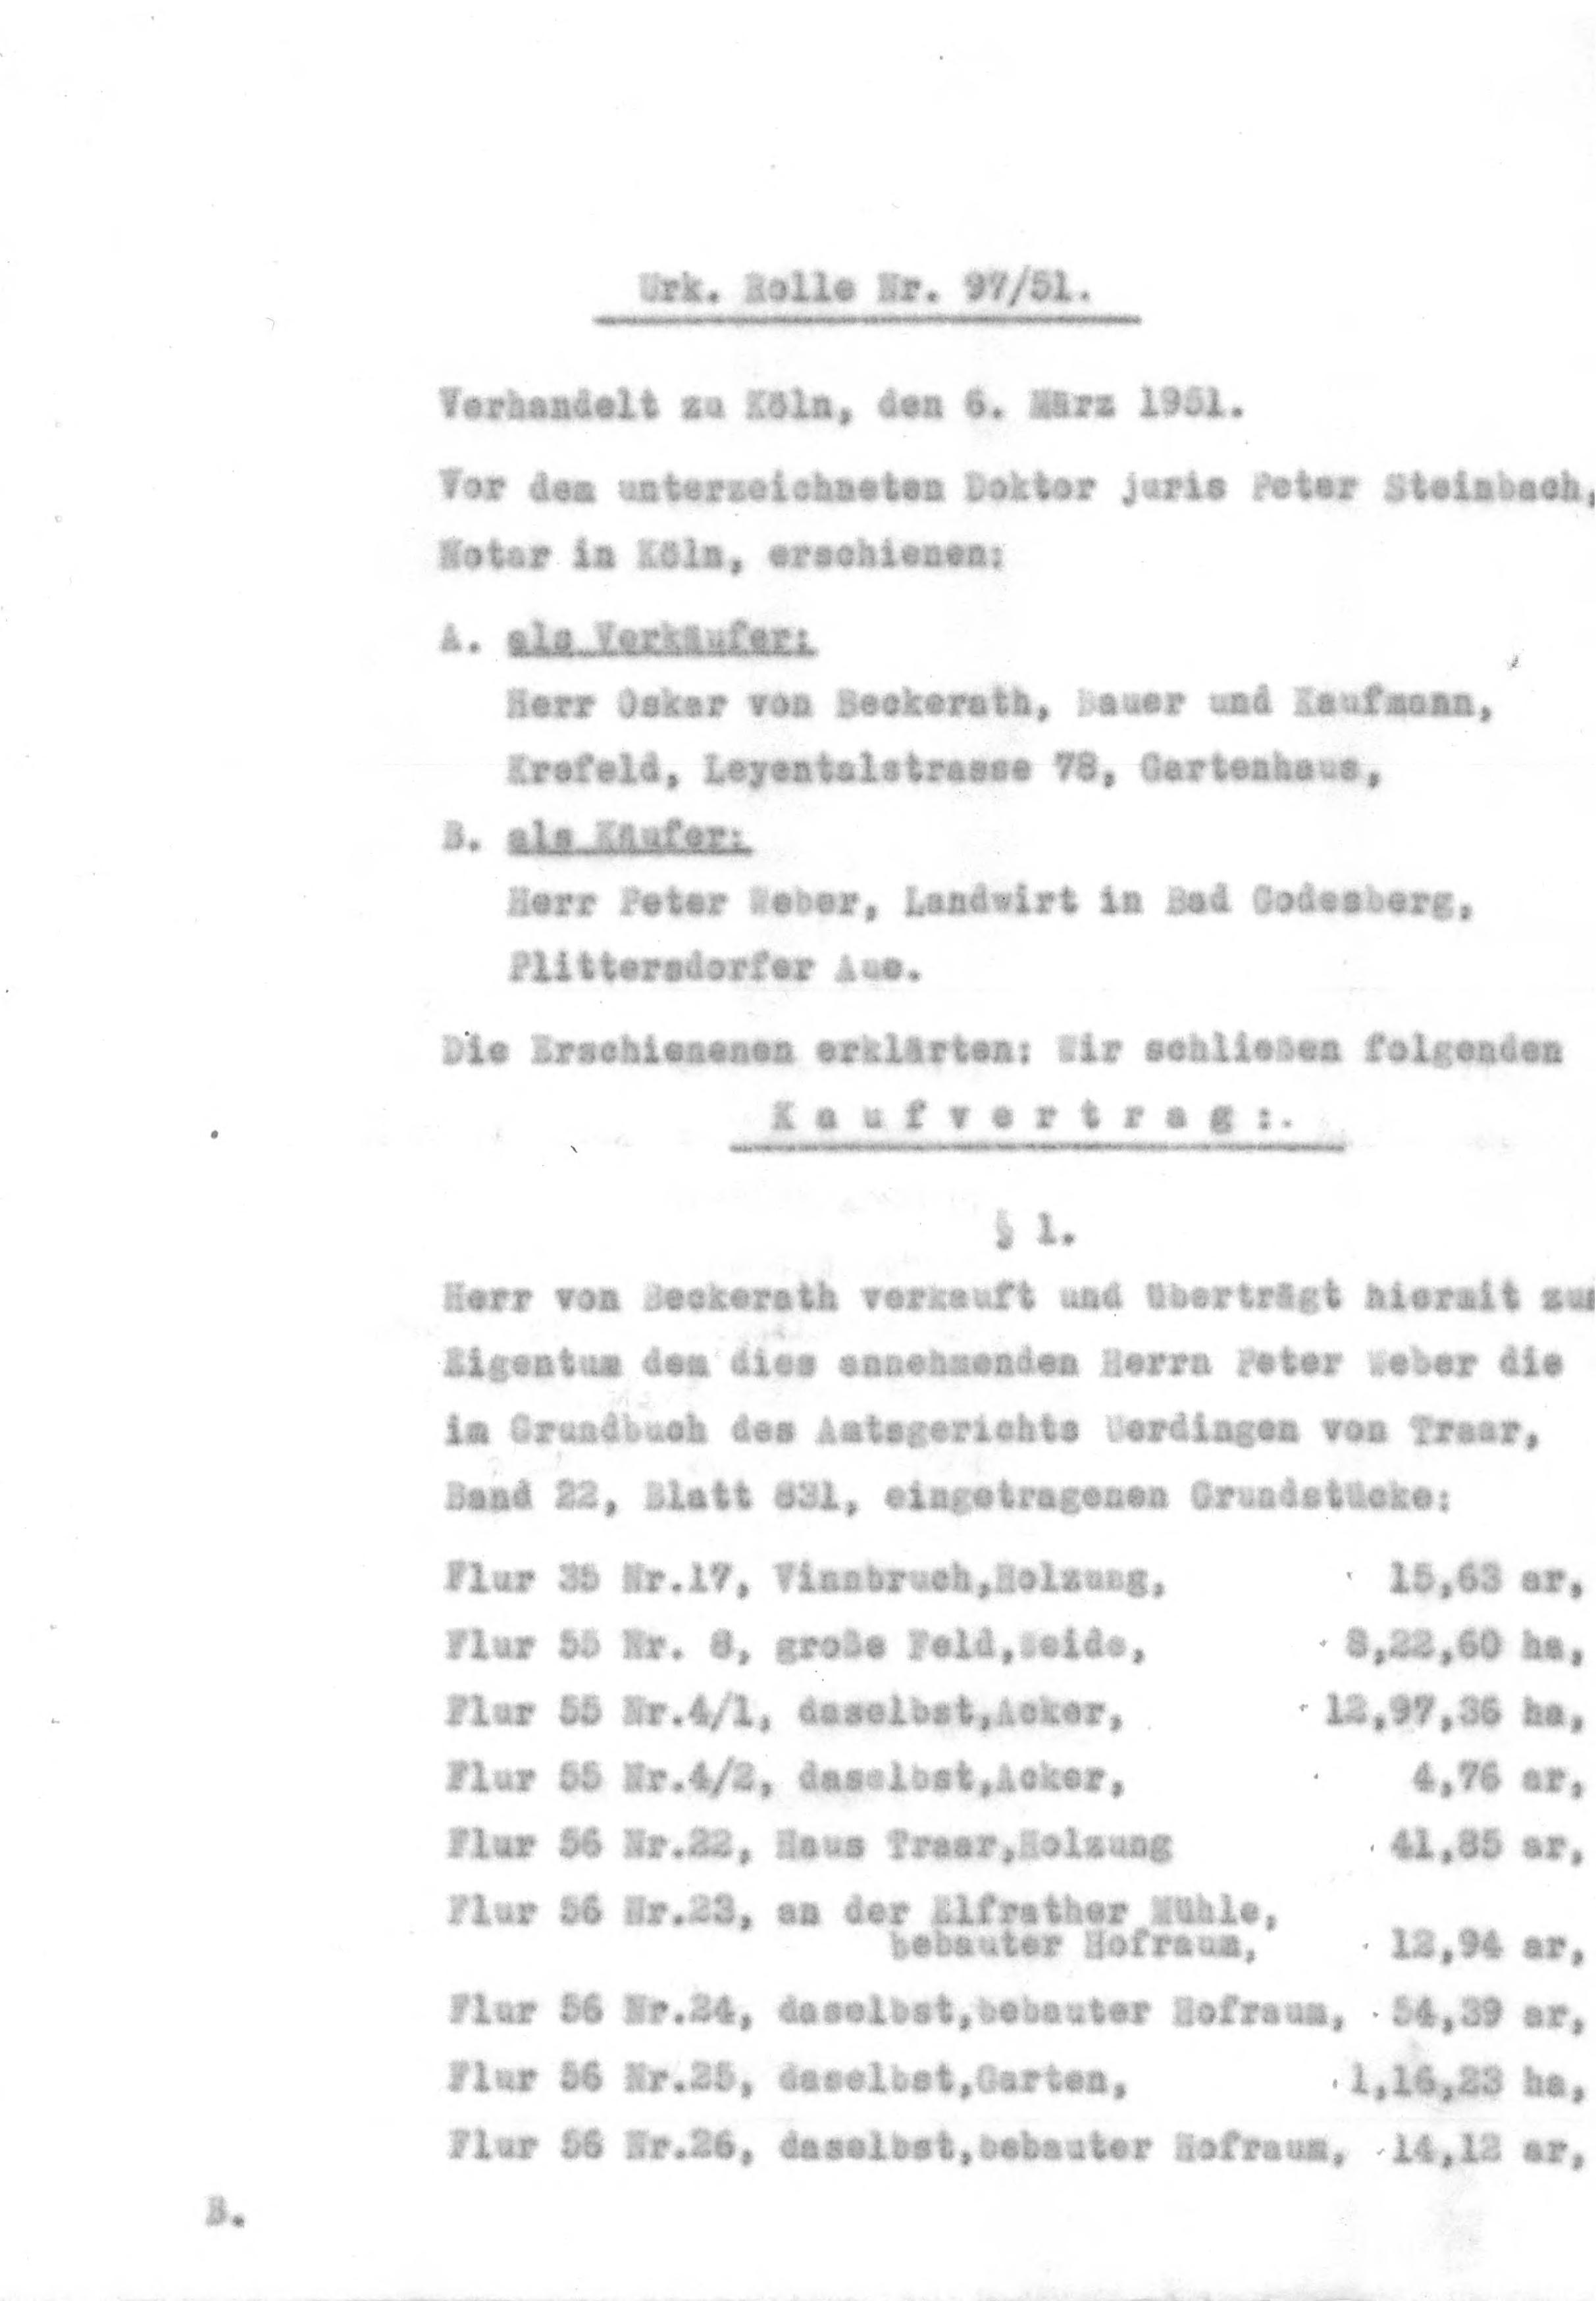 File:Kaufvertrag Haus Traar 1951.djvu - Wikimedia Commons